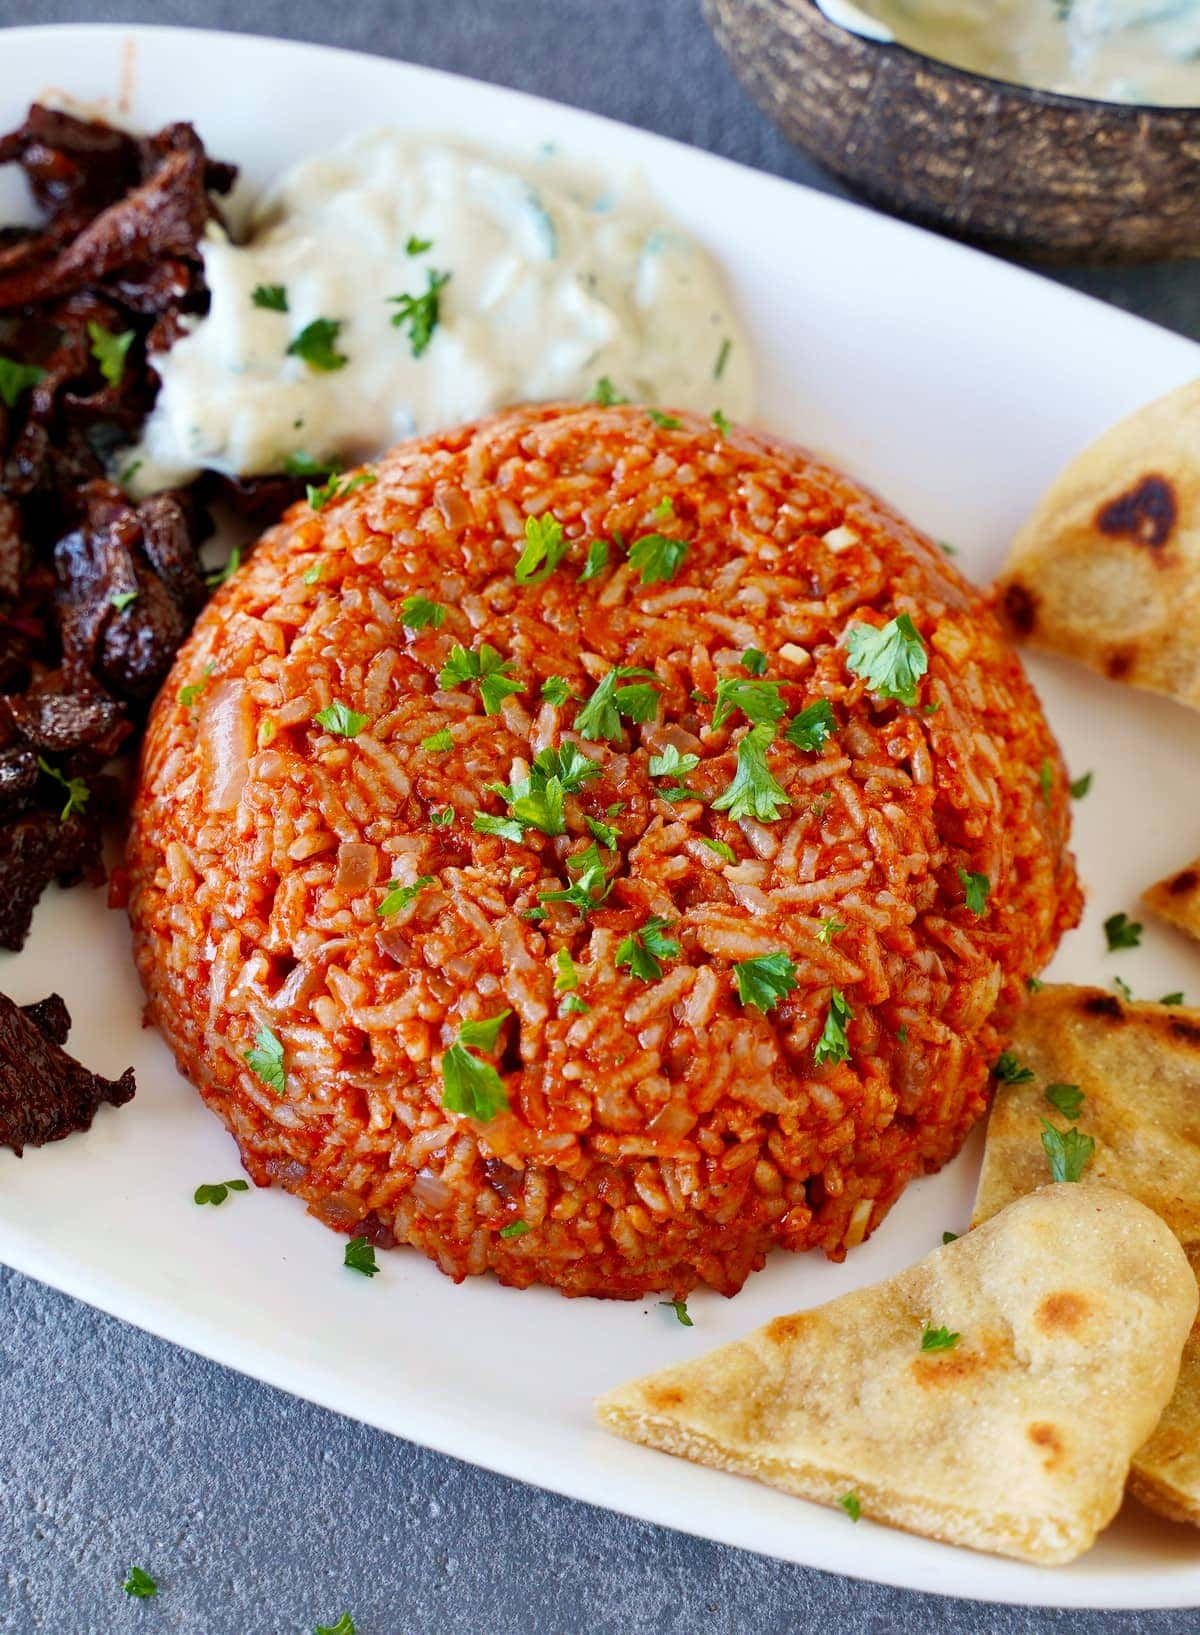 Greek tomato rice with vegan gyro tzatziki and pita chips on white plate